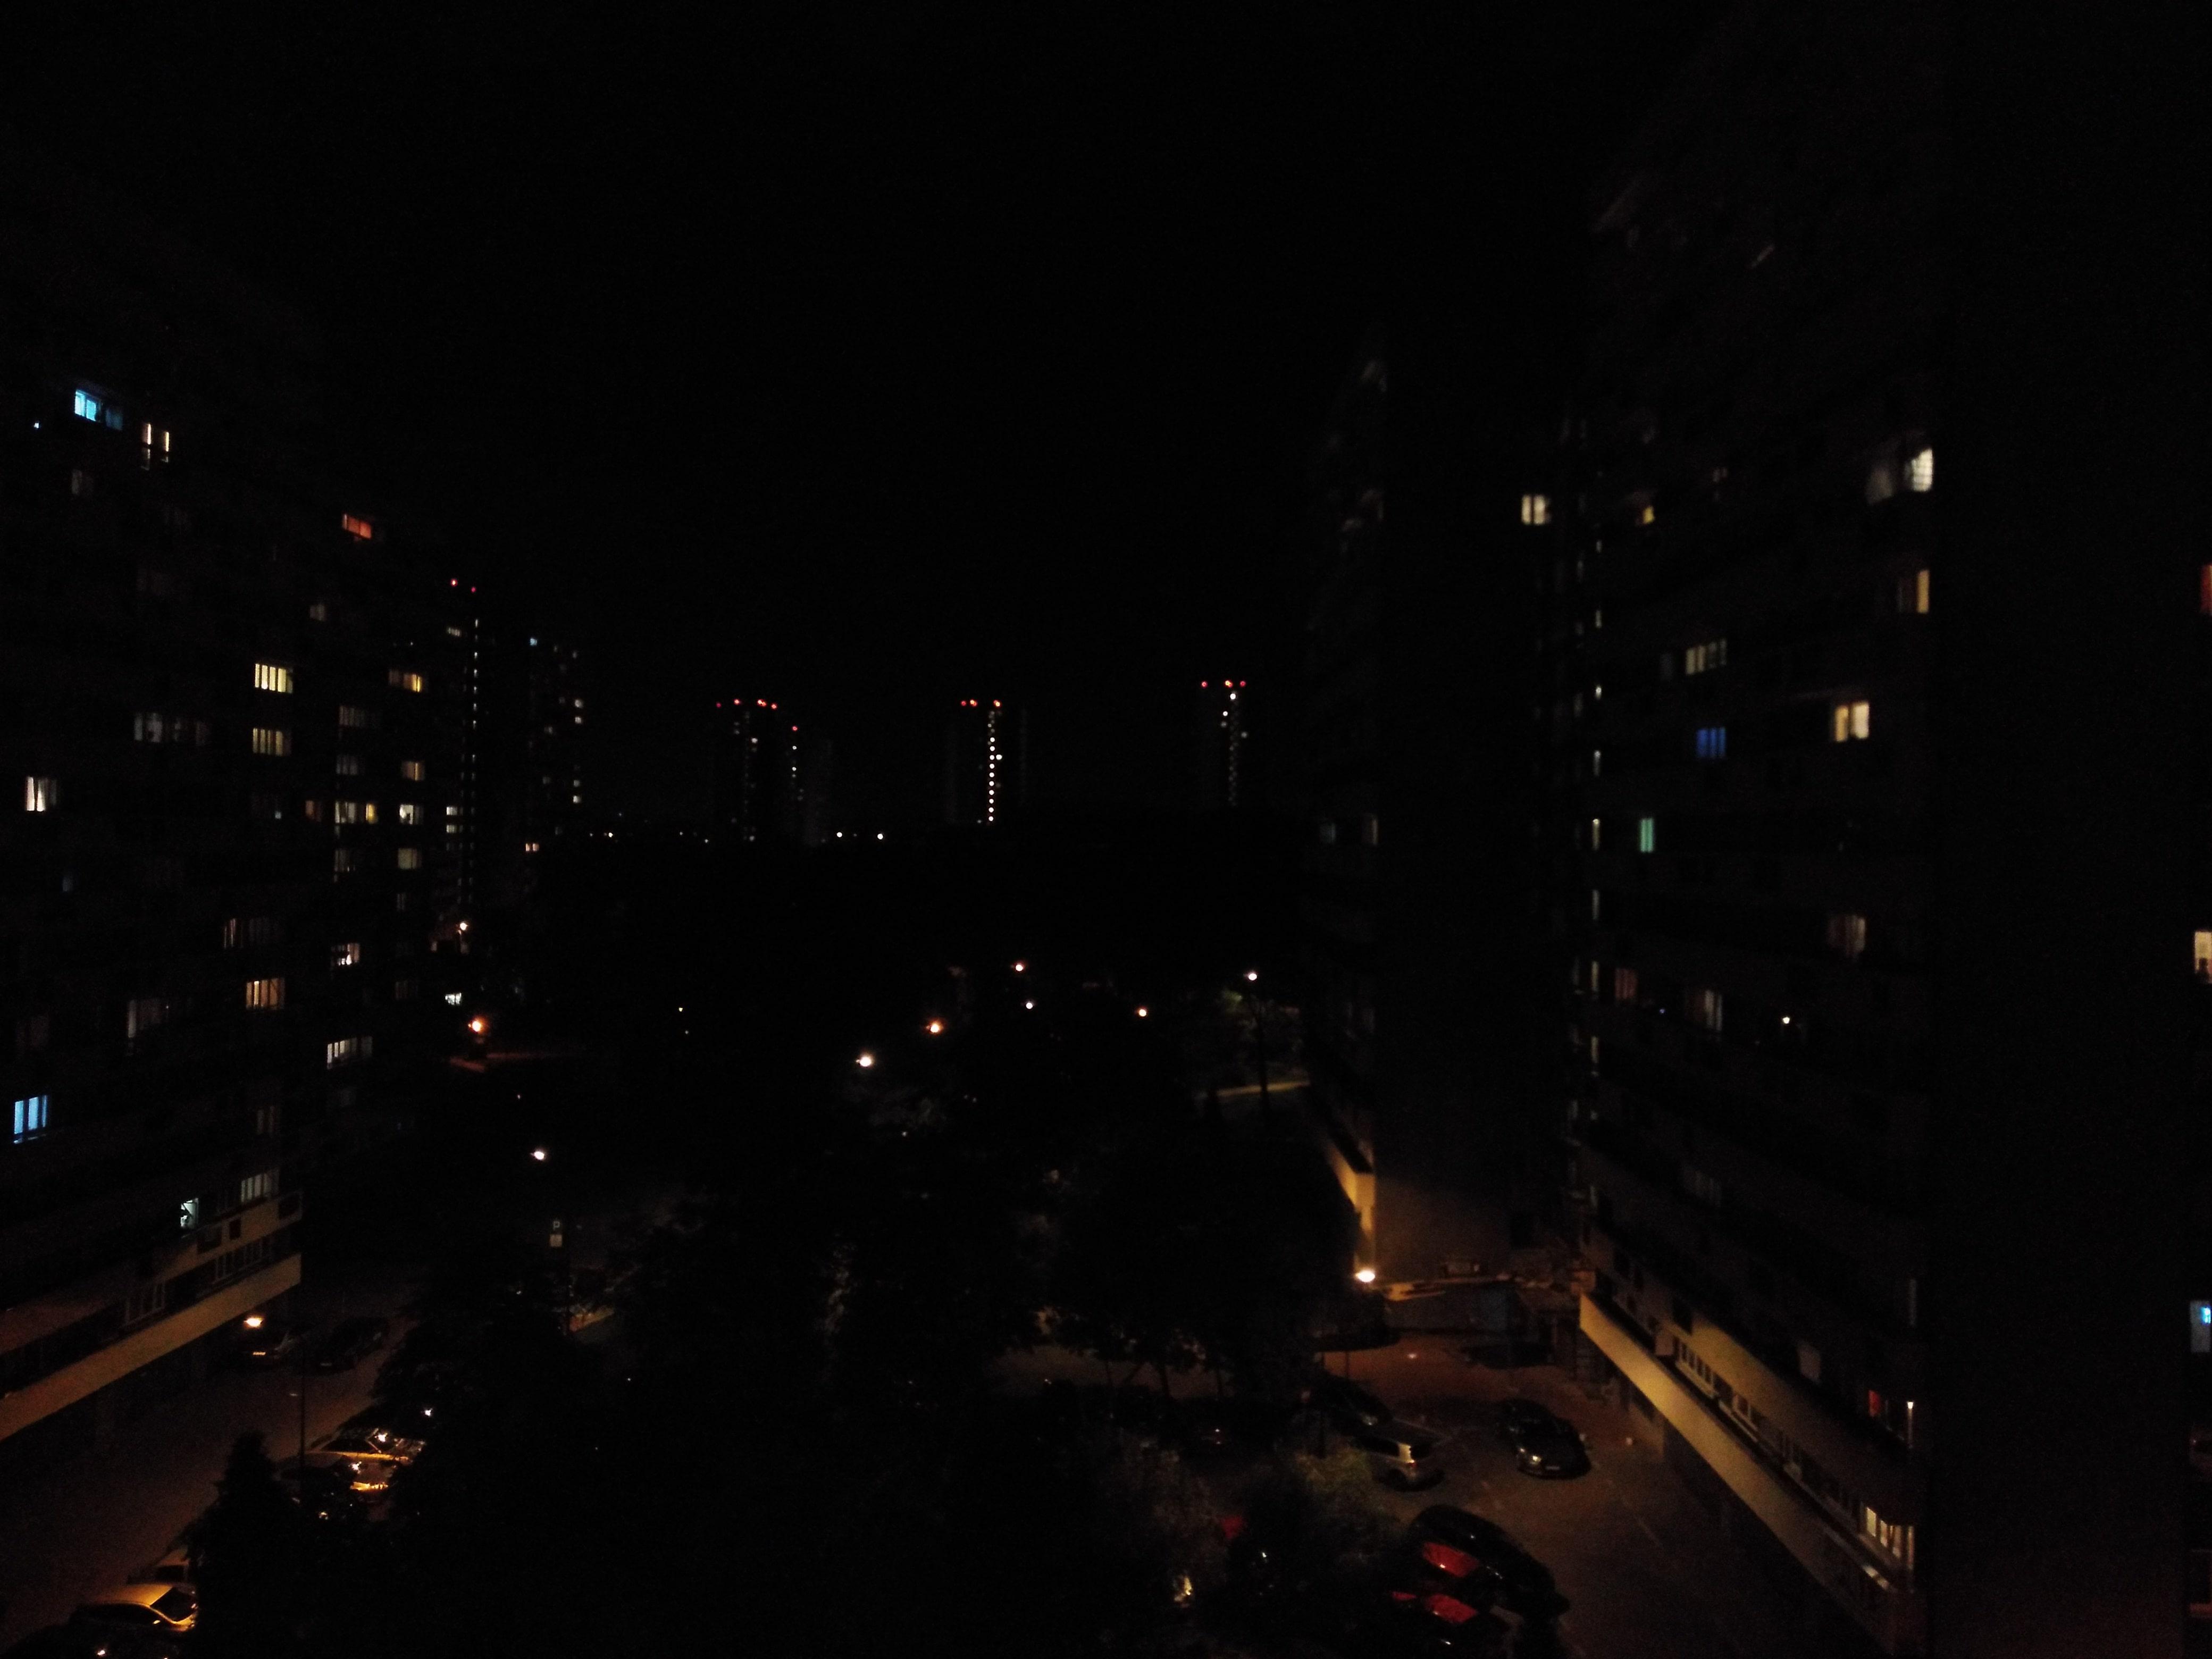 Zdjęcia nocne - Huawei Y6 Prime 2018